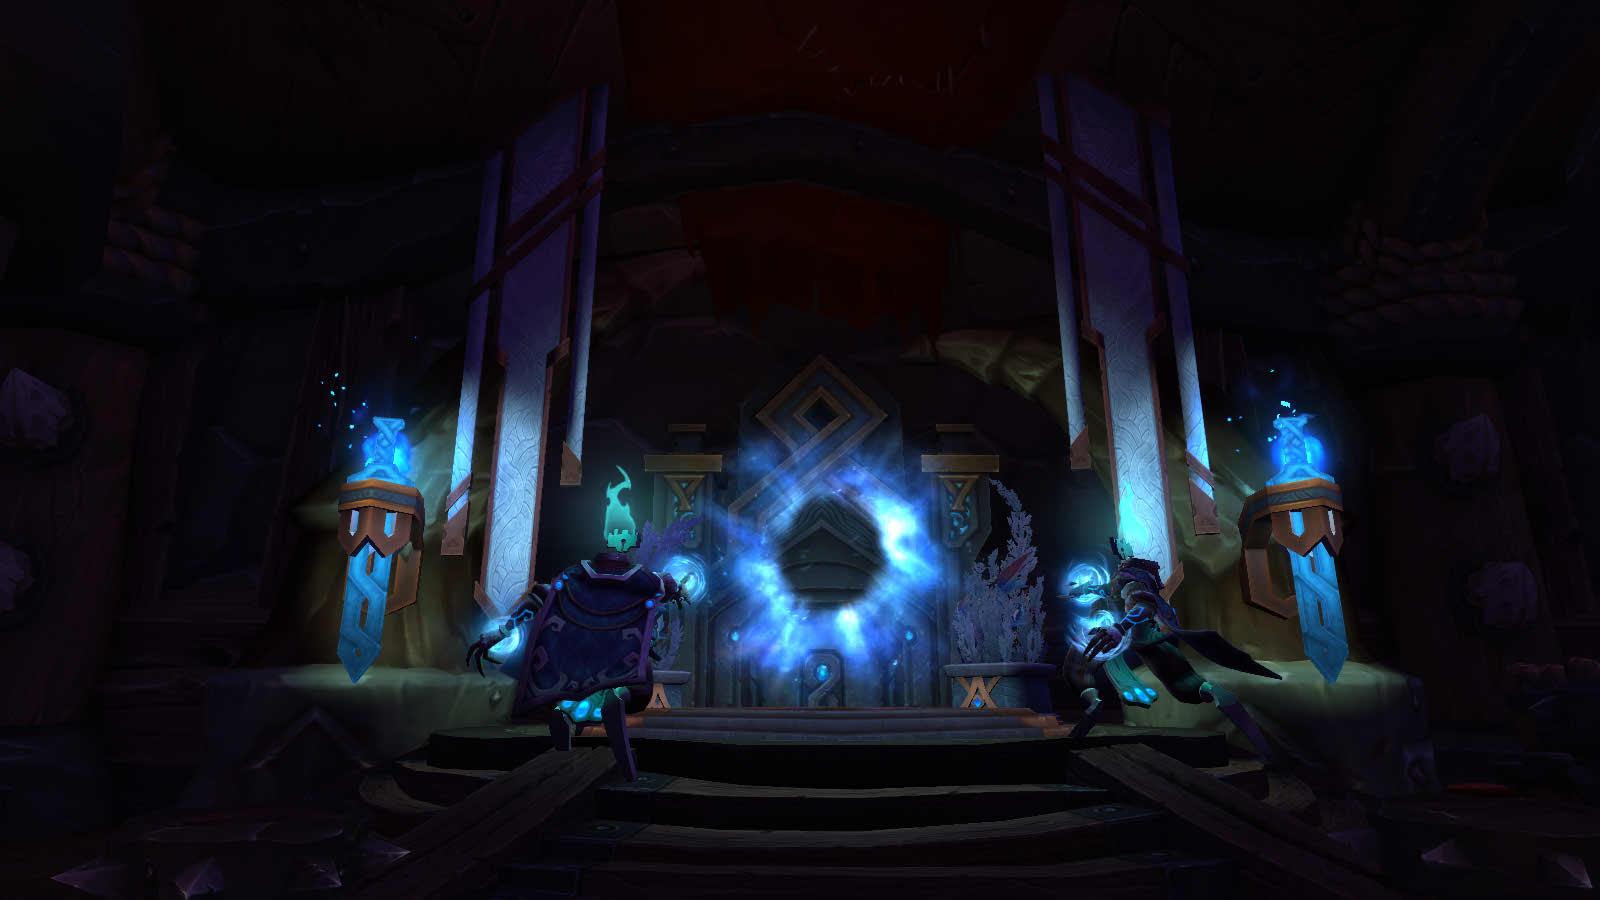 Shadowlands : portail vers Oribos à Orgrimmar